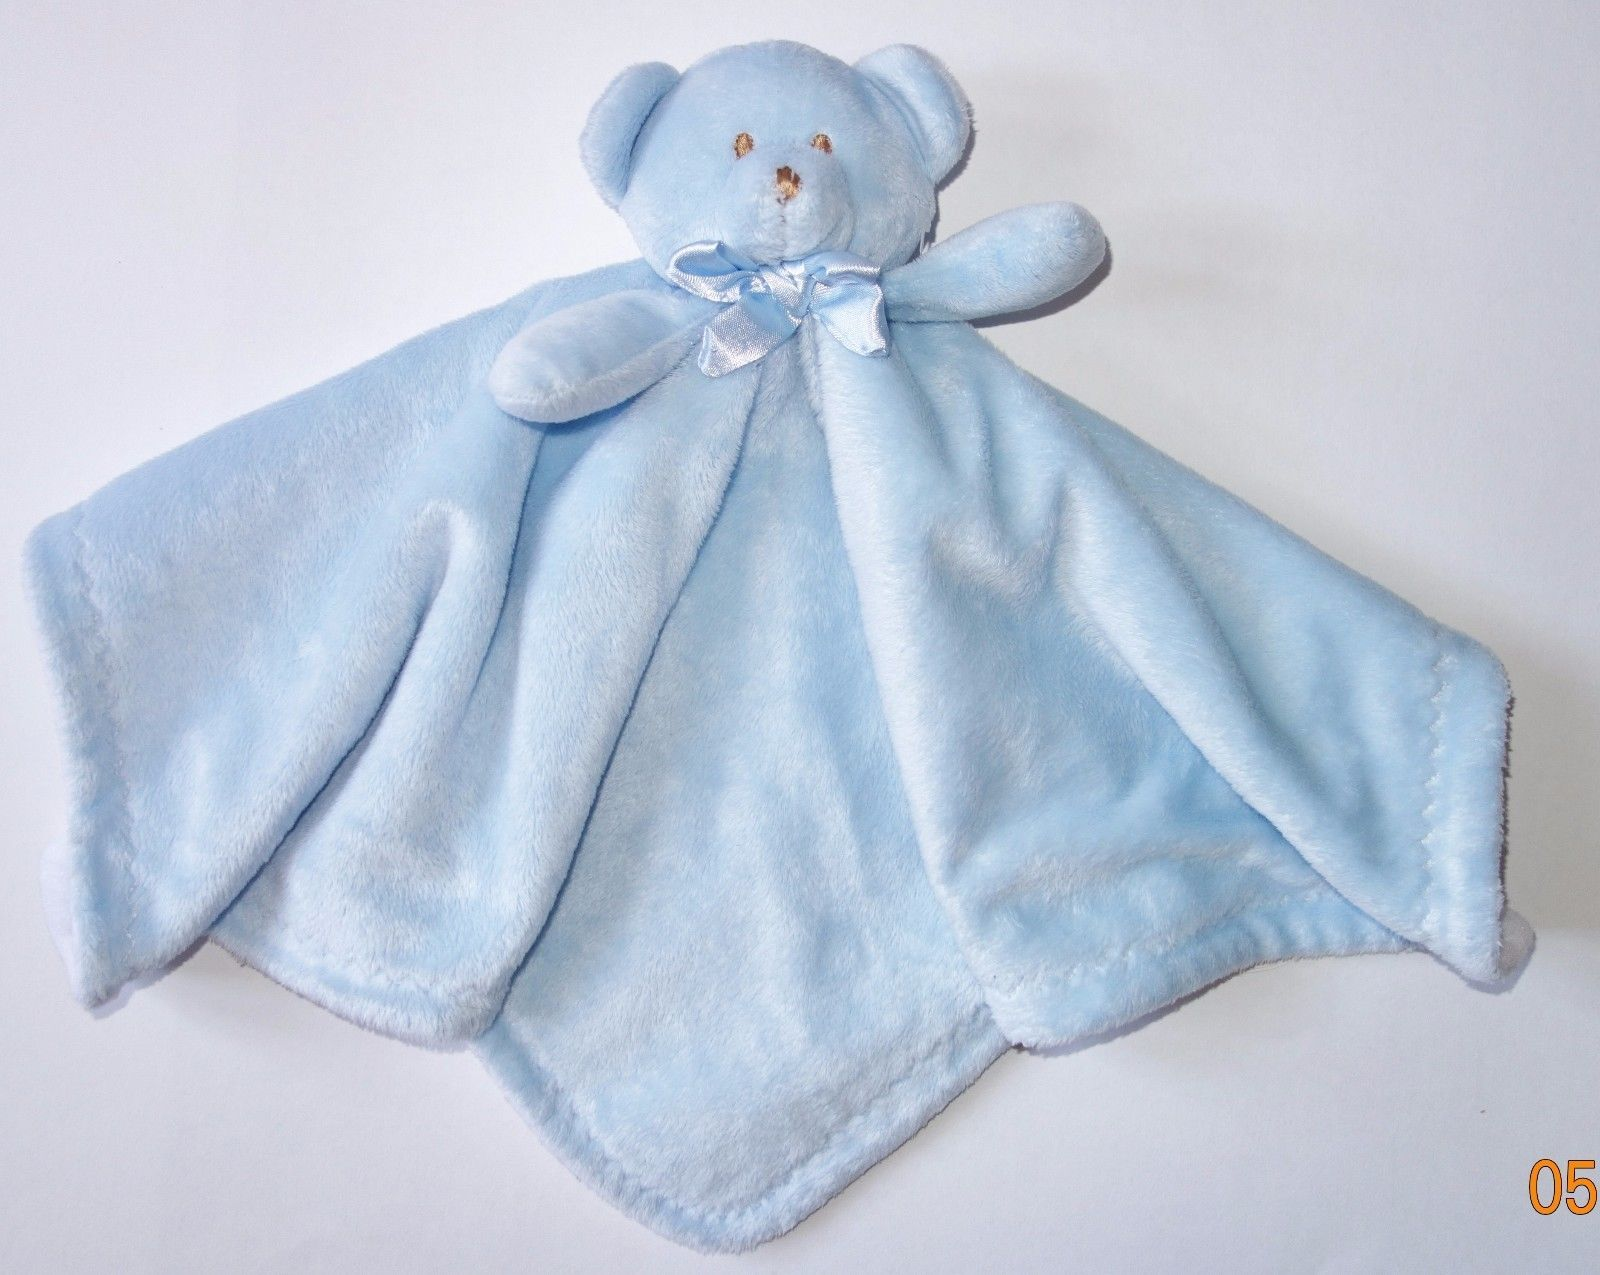 Baby Blankets And Beyond Blanket 5 Listings